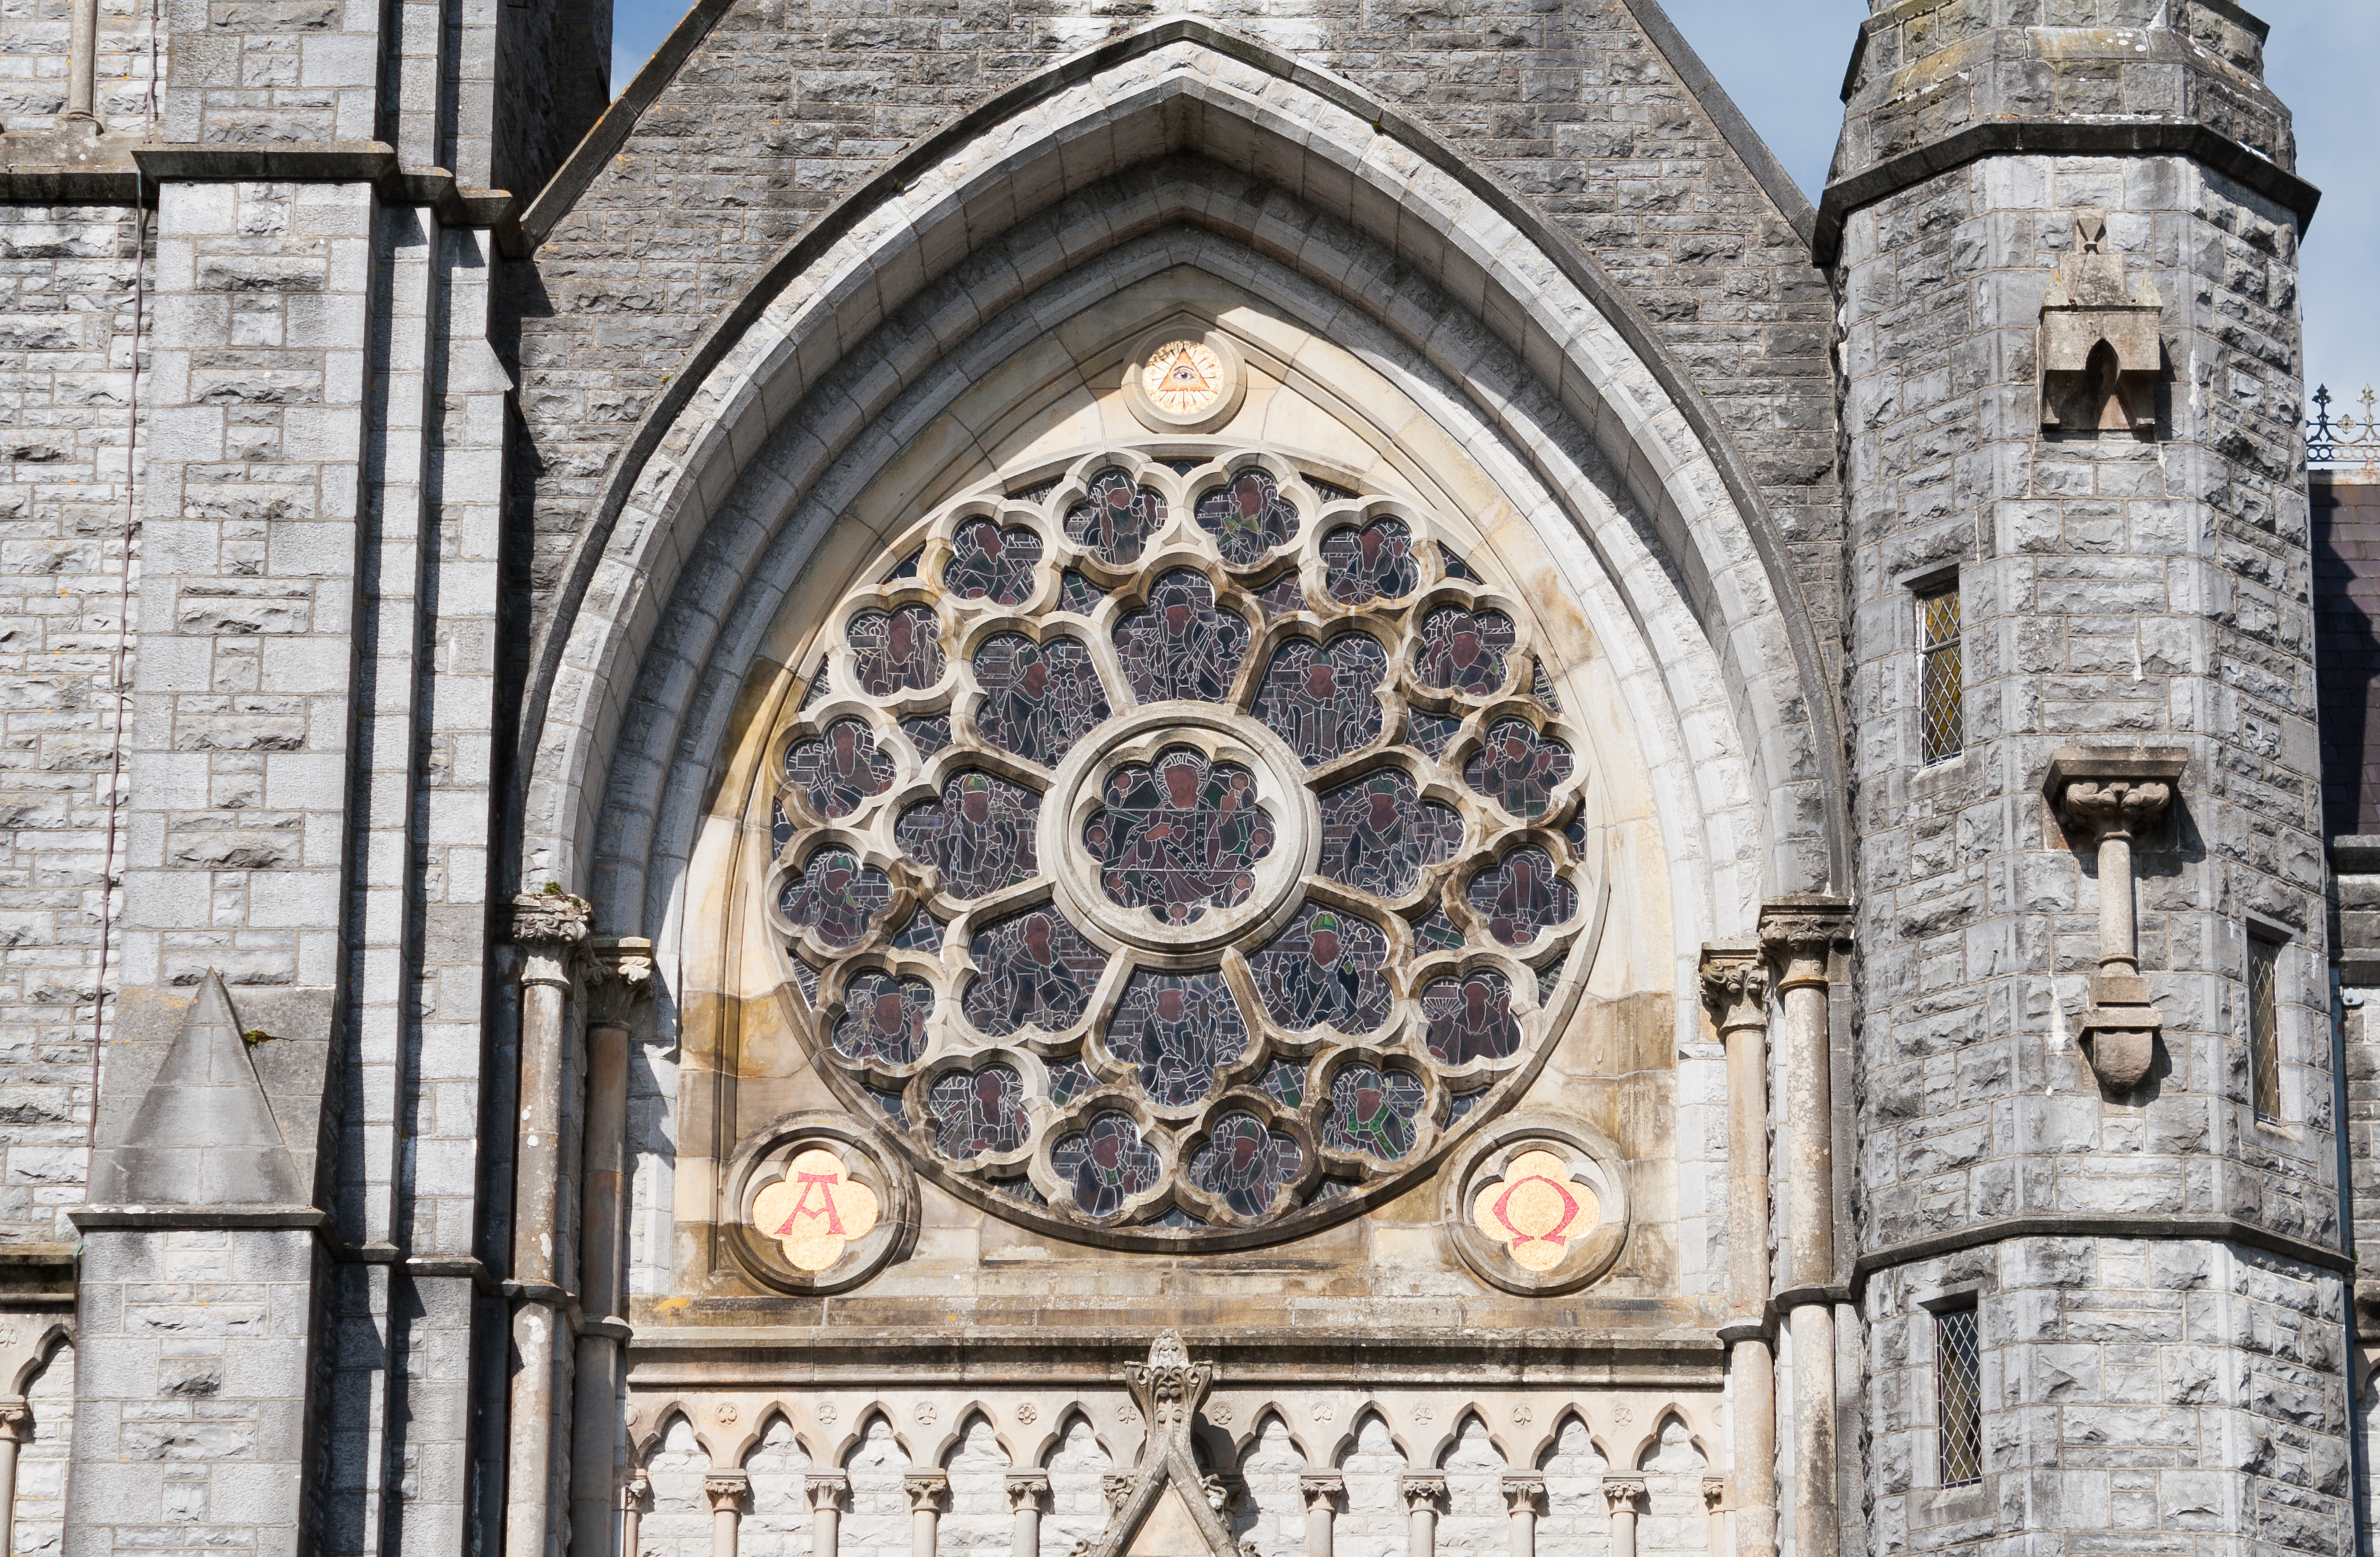 File:Roscommon Sacred Heart Church Rose Window Exterior 2014 08 28